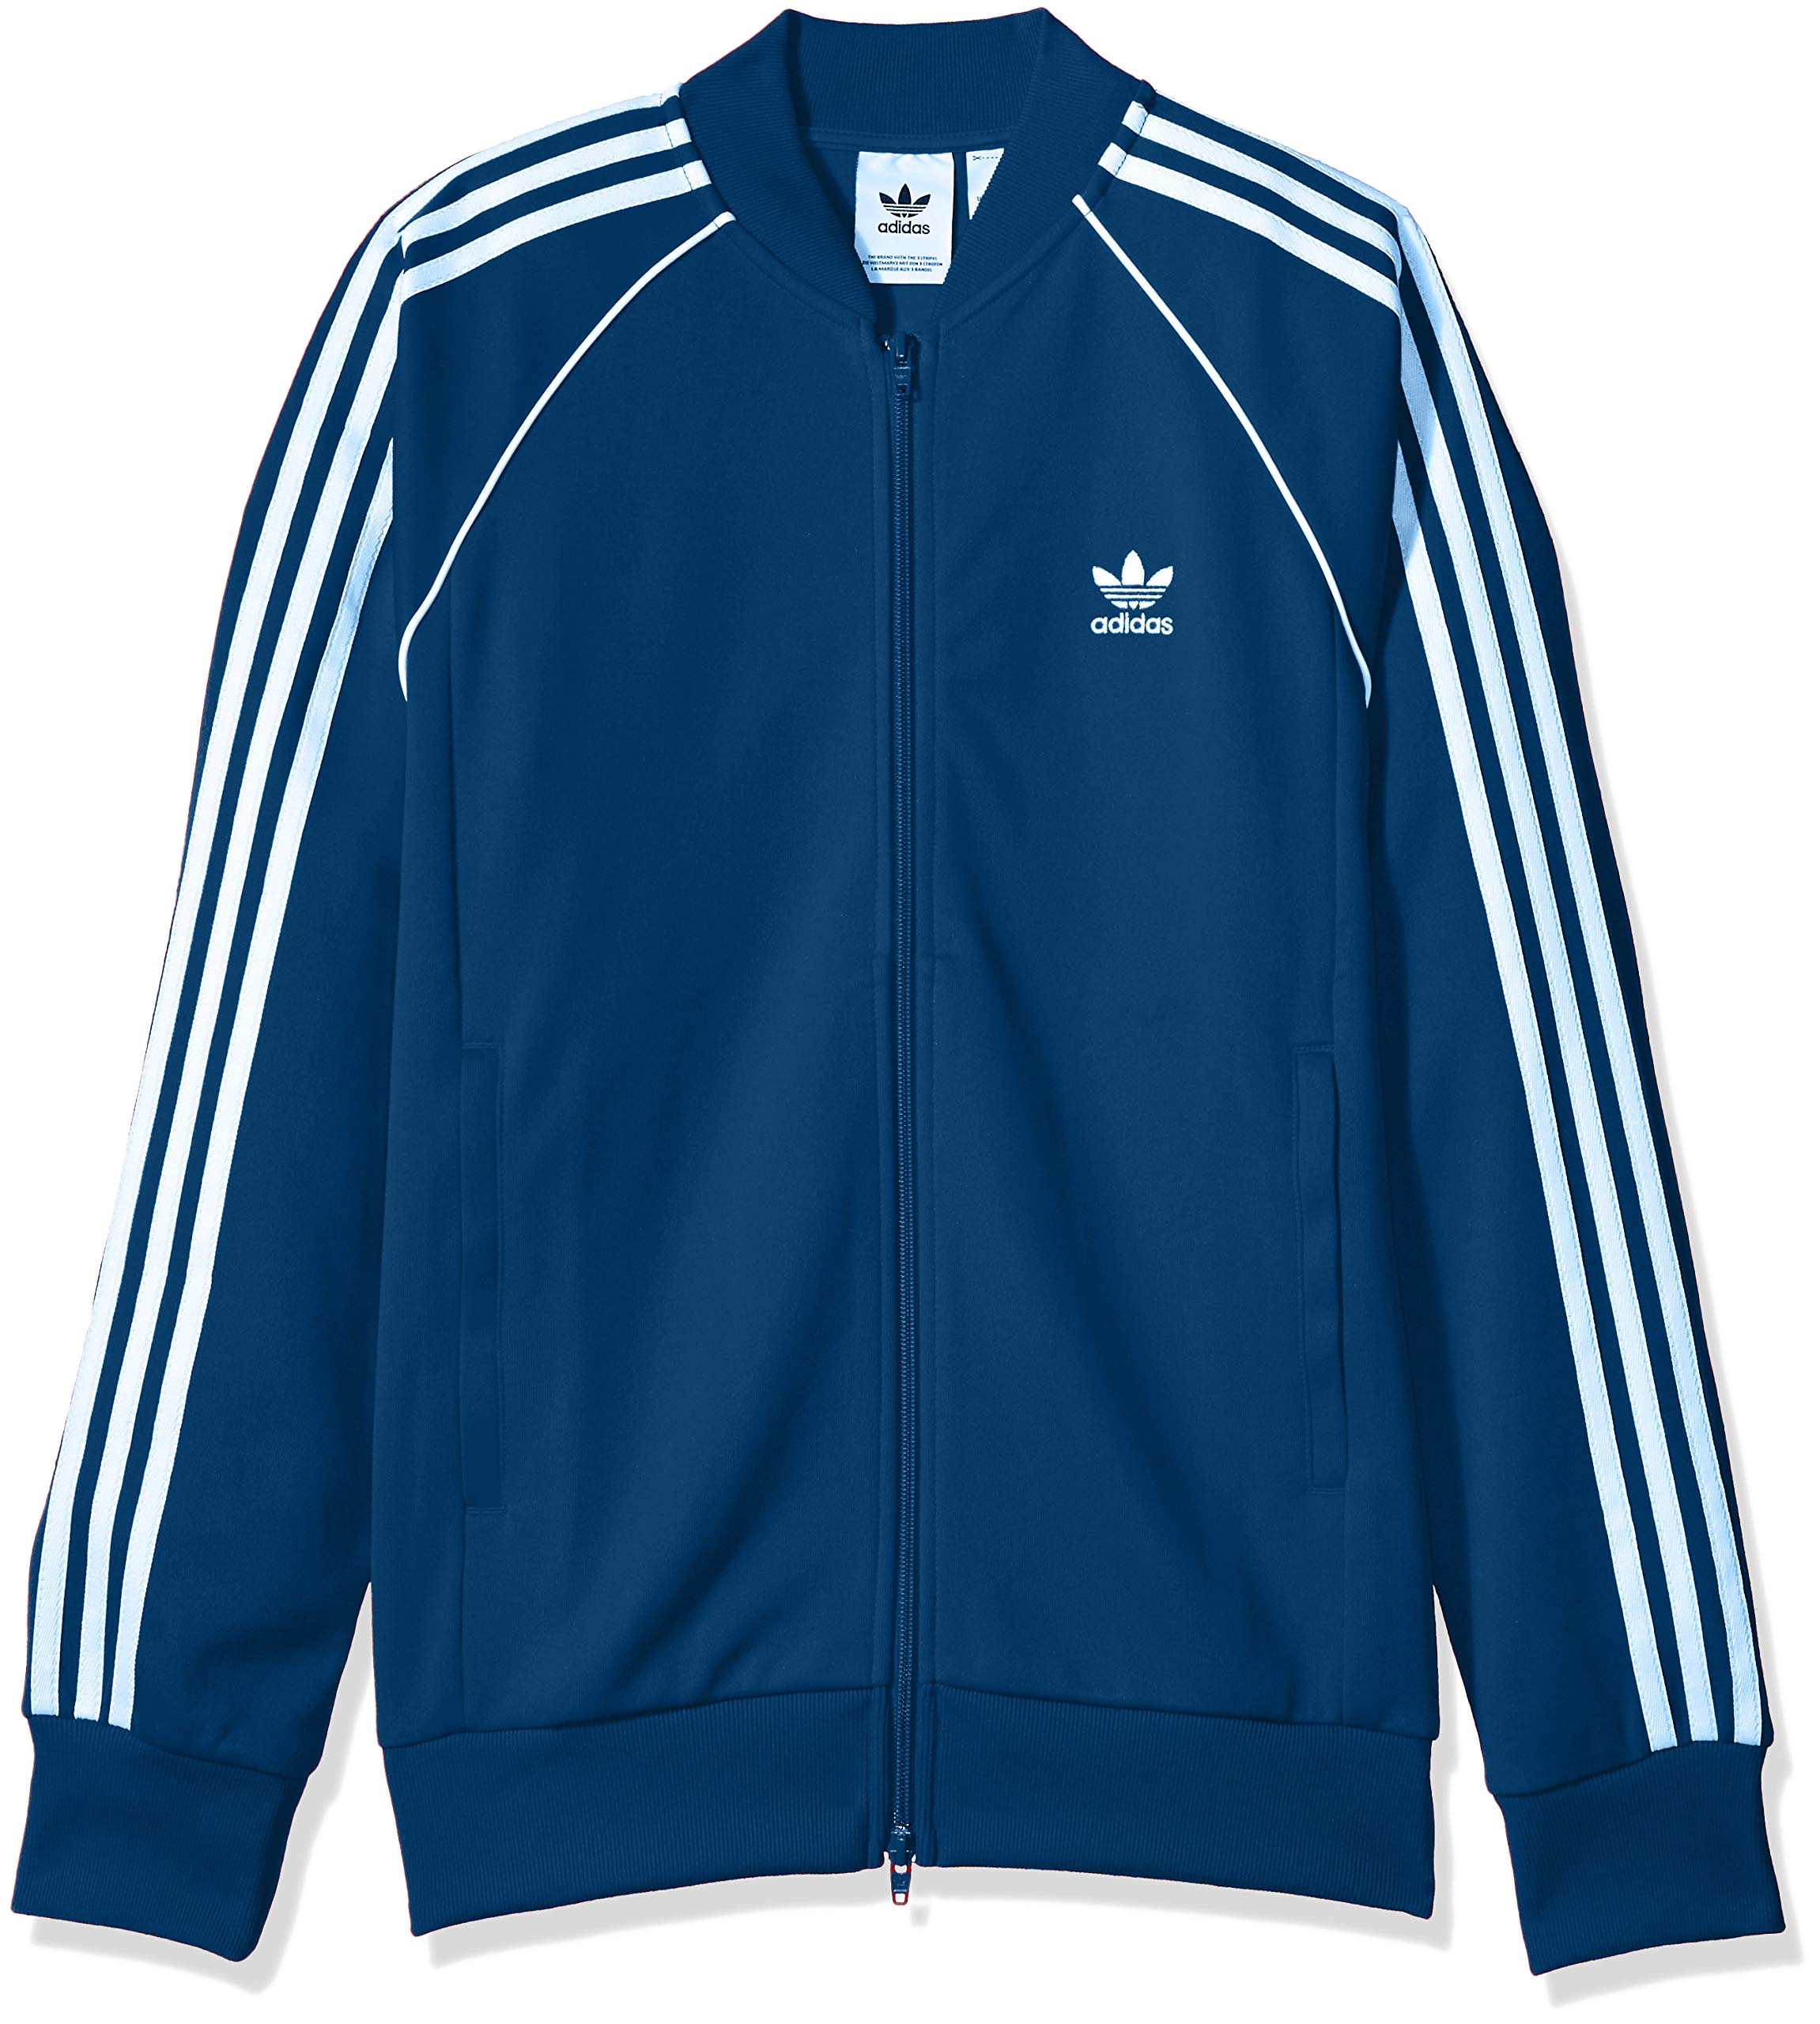 adidas Originals Men's Superstar Track Jacket, legend marine, Medium by adidas Originals